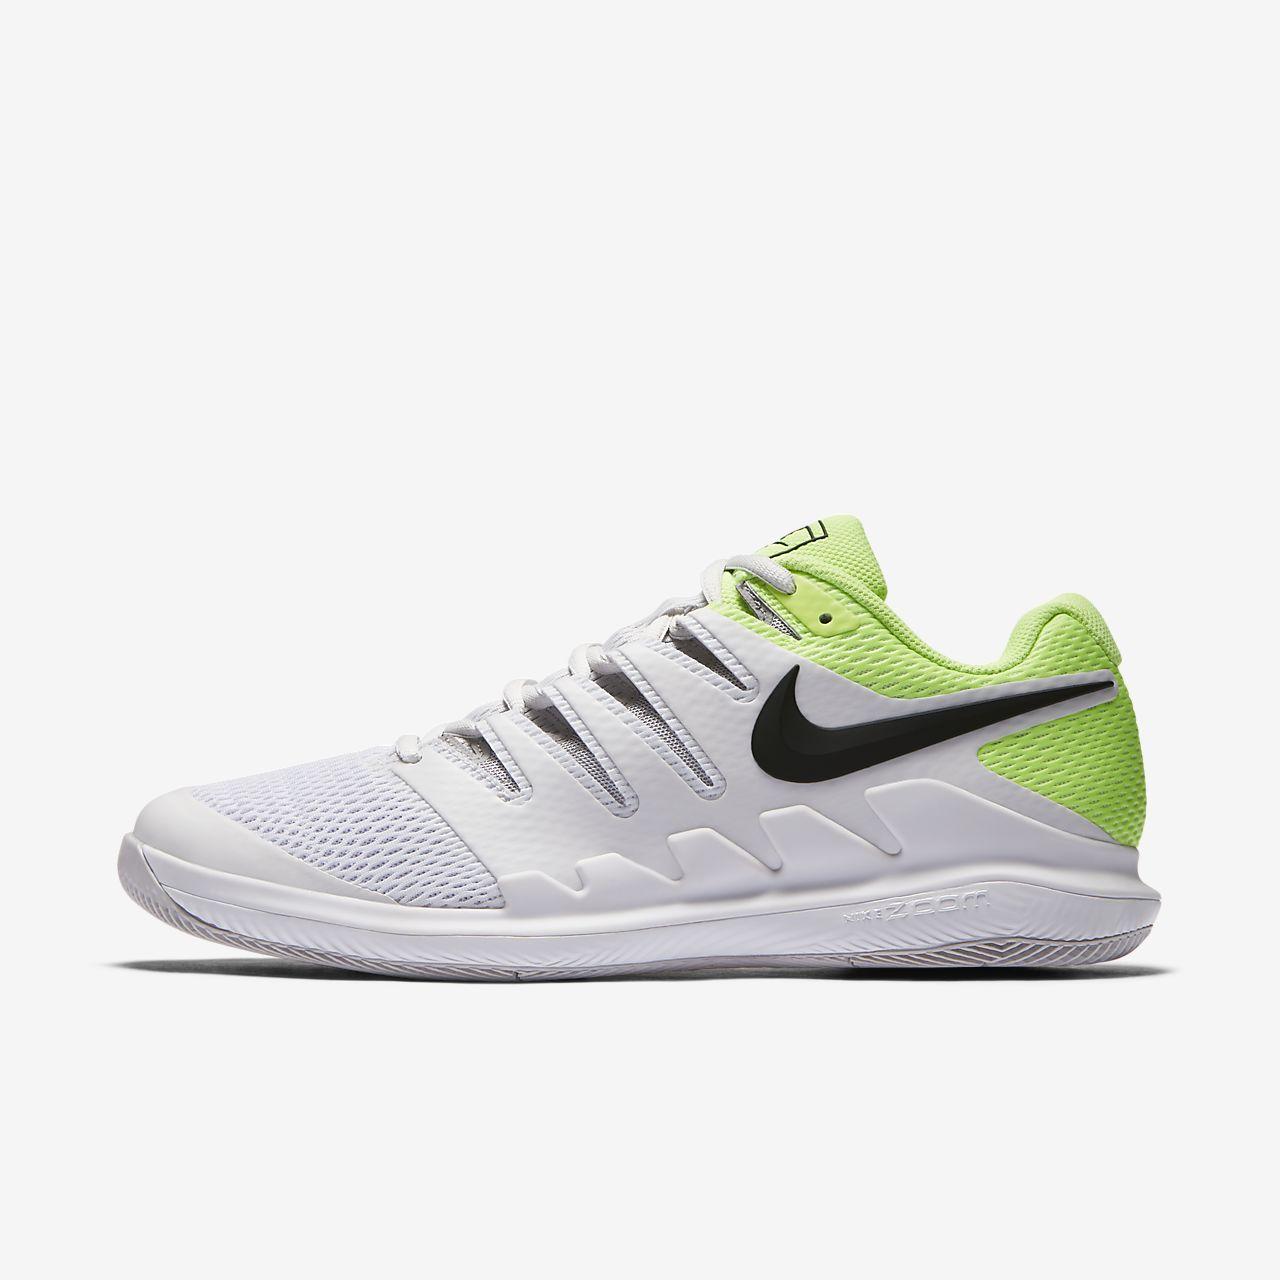 Nike Free Run 3 0 Hommes Uk Sandales Bleu Marine En Mousse Statique Walmart